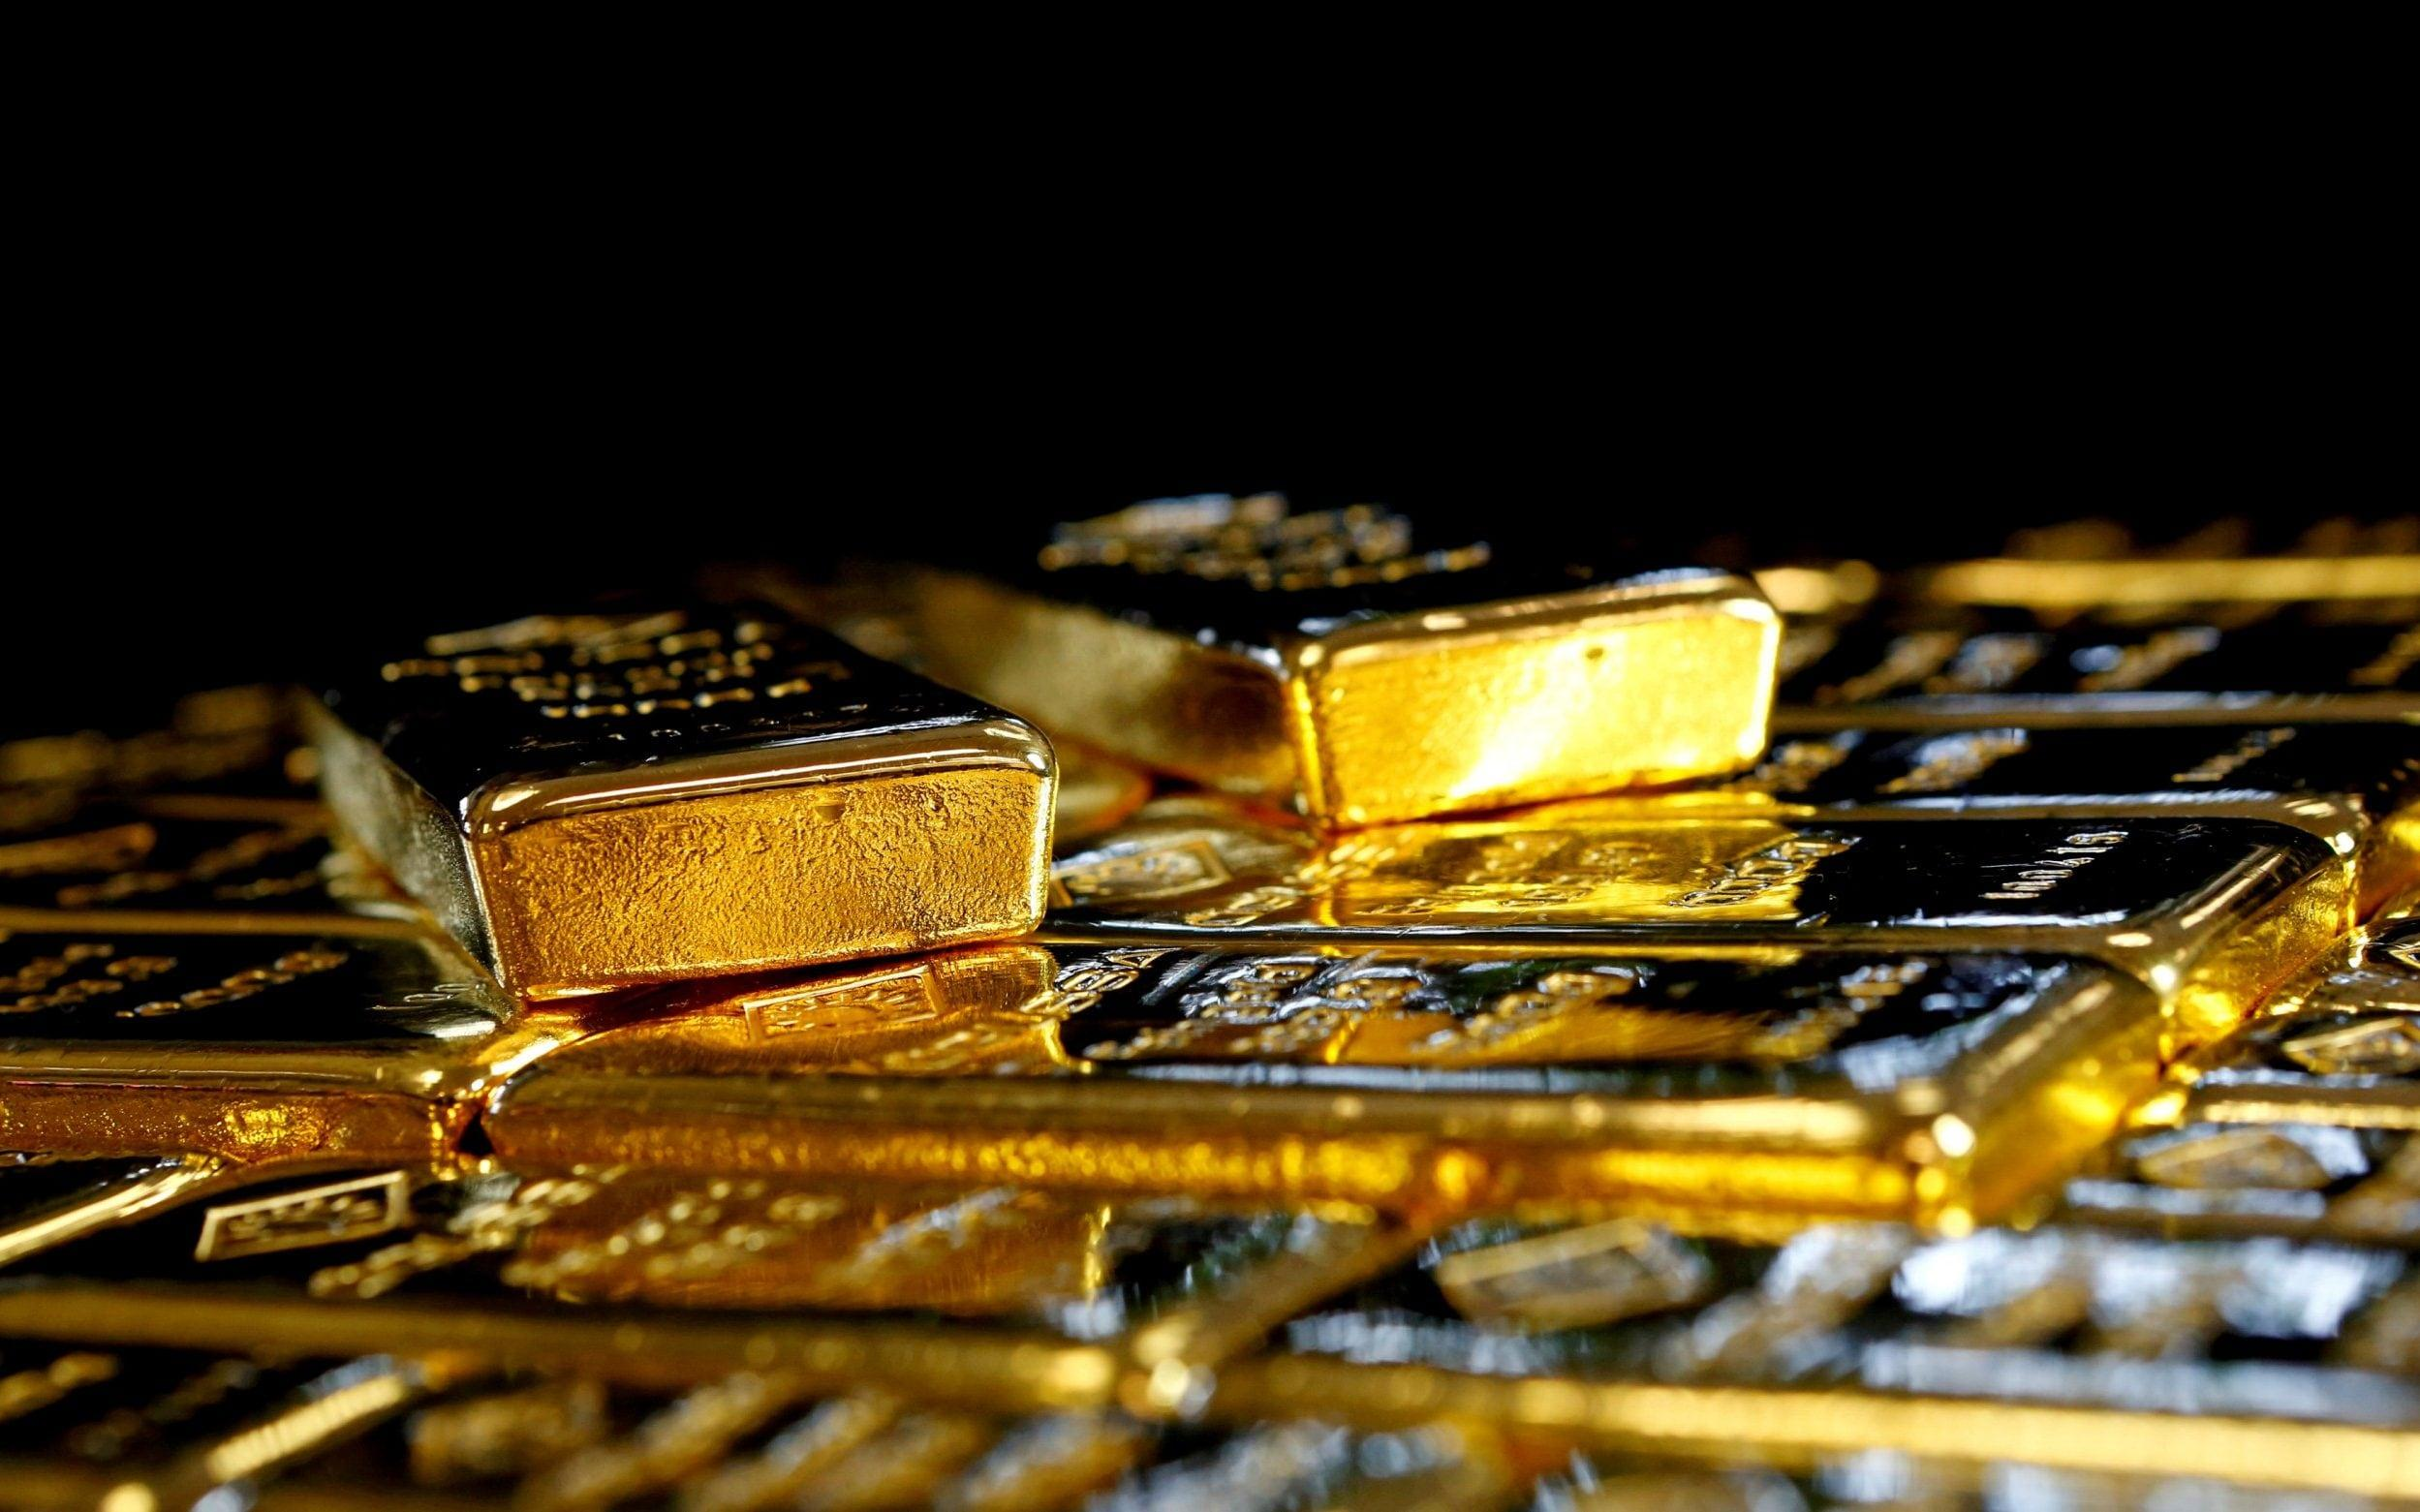 Zimbabwe mining official took gold bars by 'accidentally picking up wrong handbag'